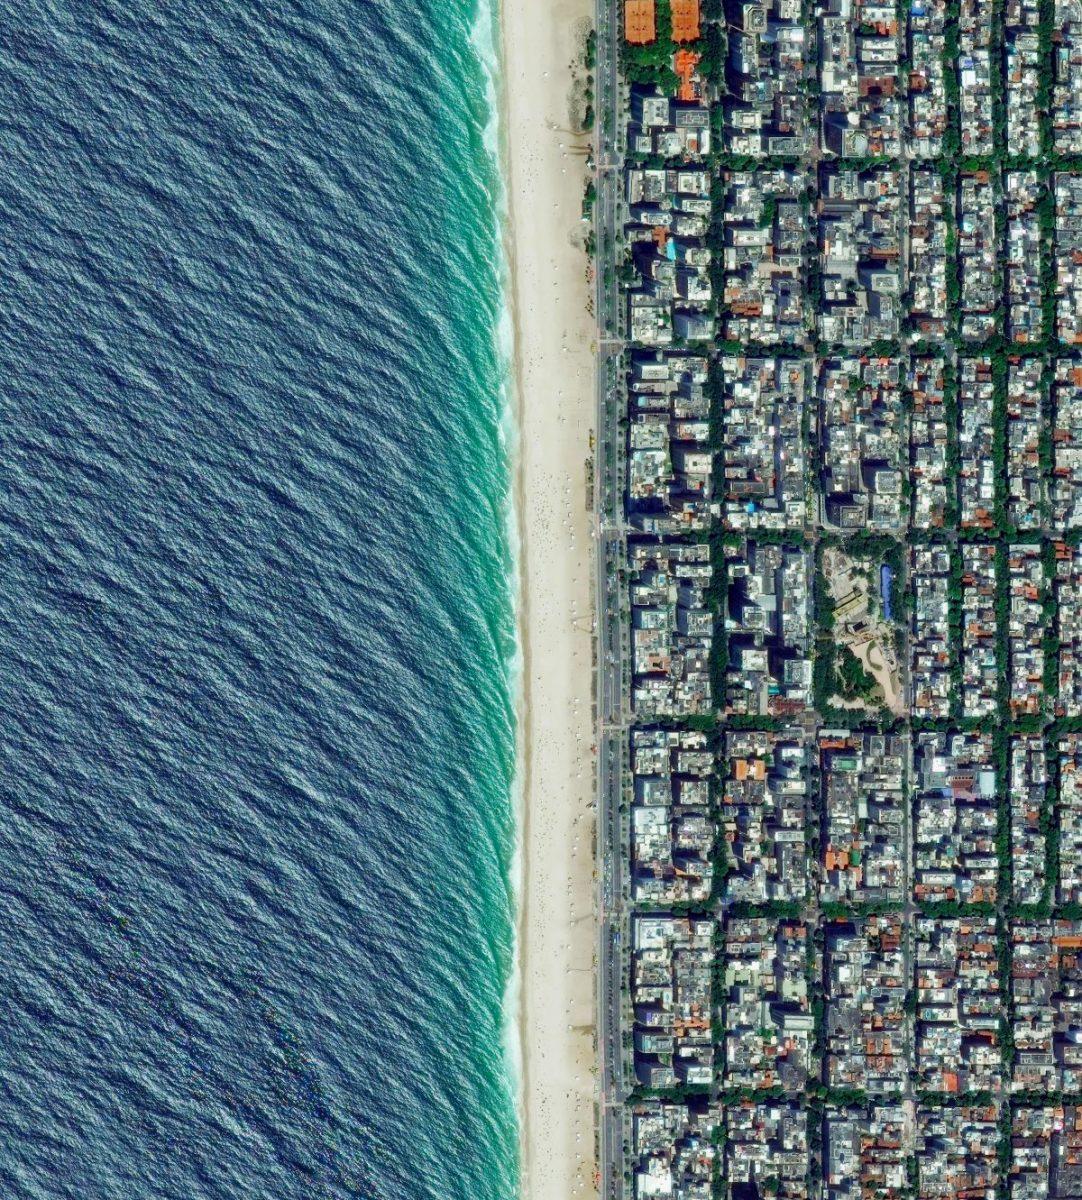 rio-satellietbeelden-femfem